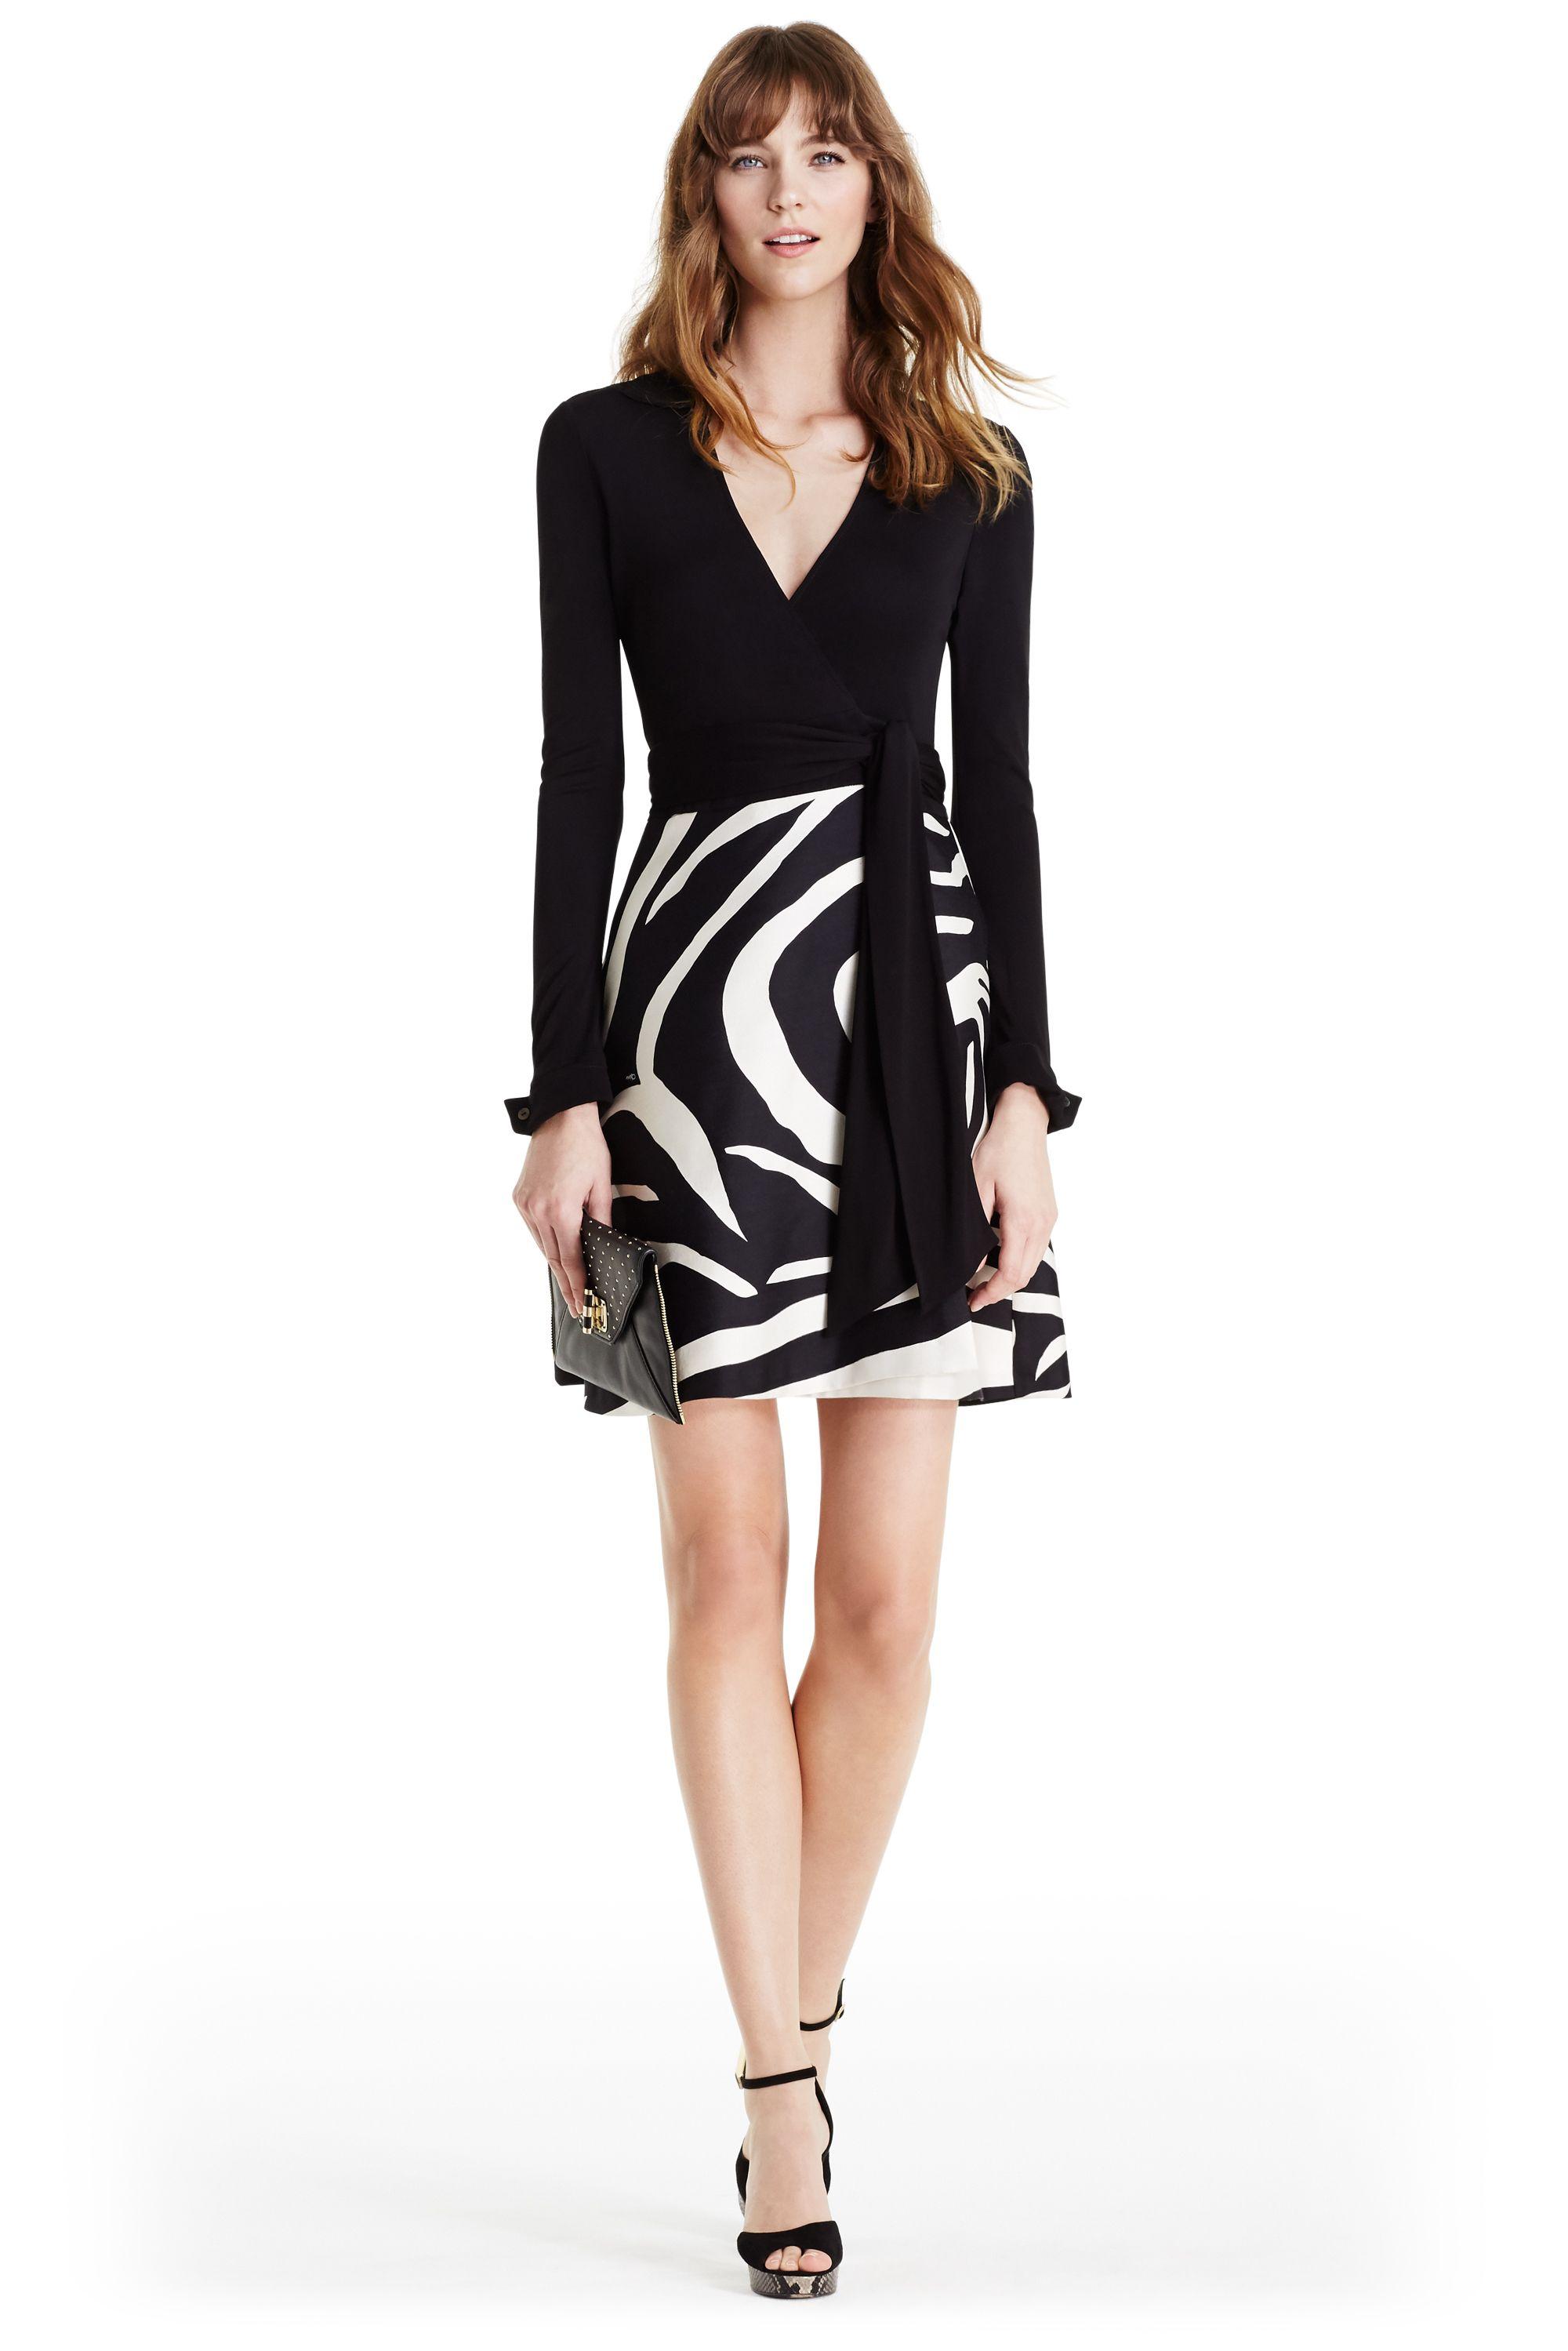 9ec7dbfb322 DVF Amelianna Silk Combo Wrap Dress in black  zebra simple black  DVFholiday